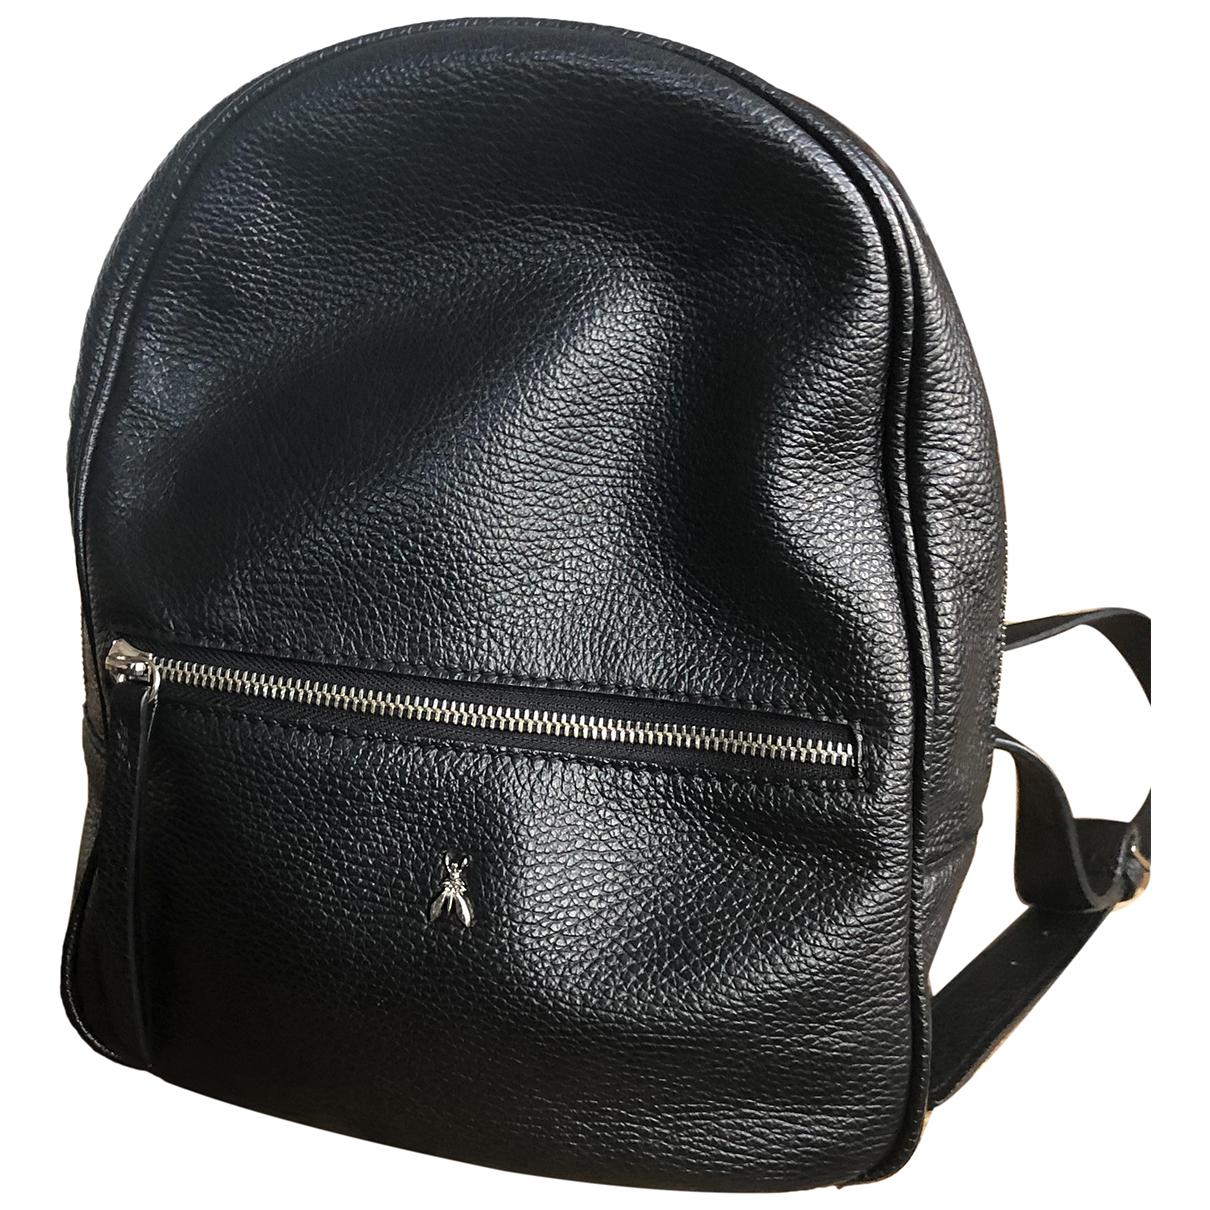 Patrizia Pepe N Black Leather backpack for Women N